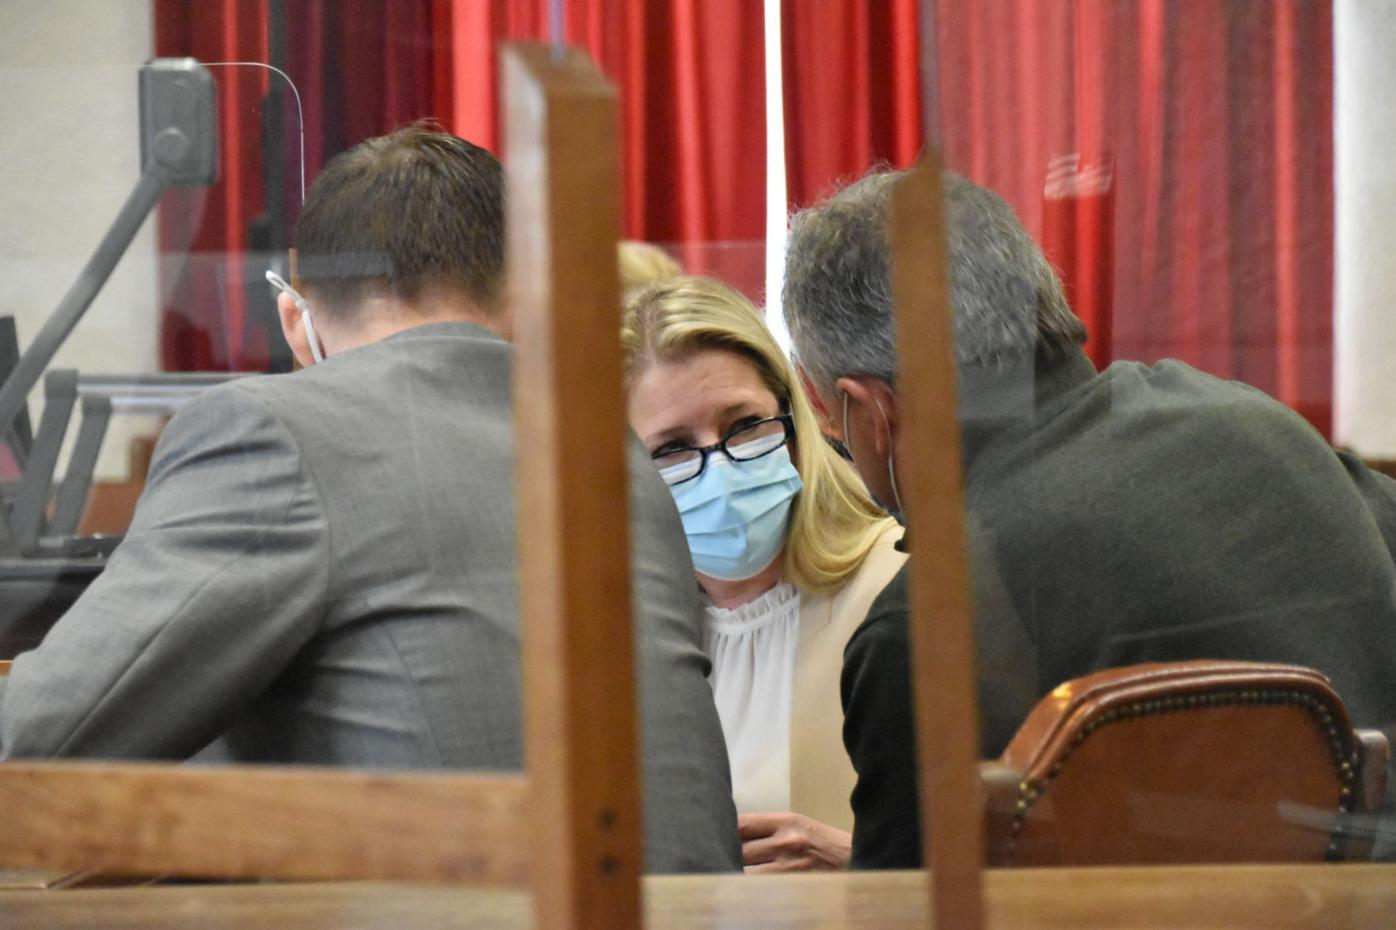 Haynie, Hoard and private investigator